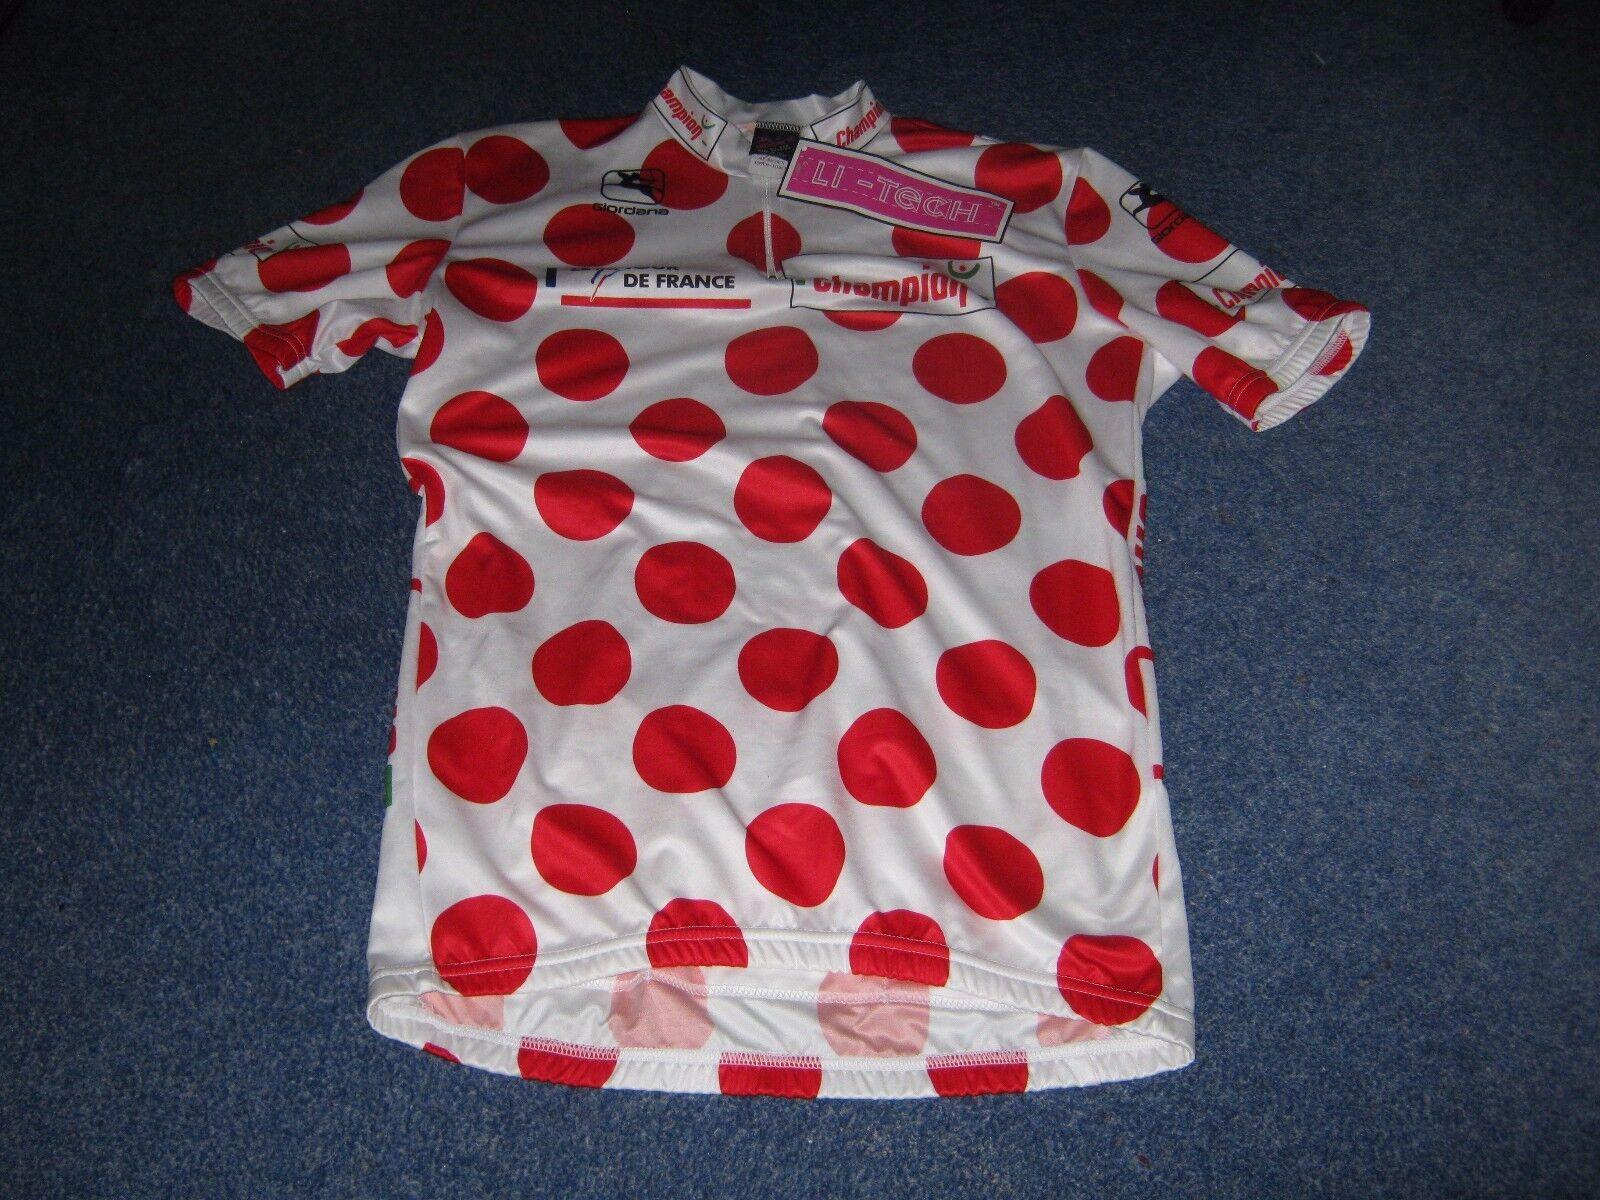 TOUR DE FRANCE 1995 GIORDANA POLKA DOT KOM LEADERS CYCLING JERSEY  BNWT